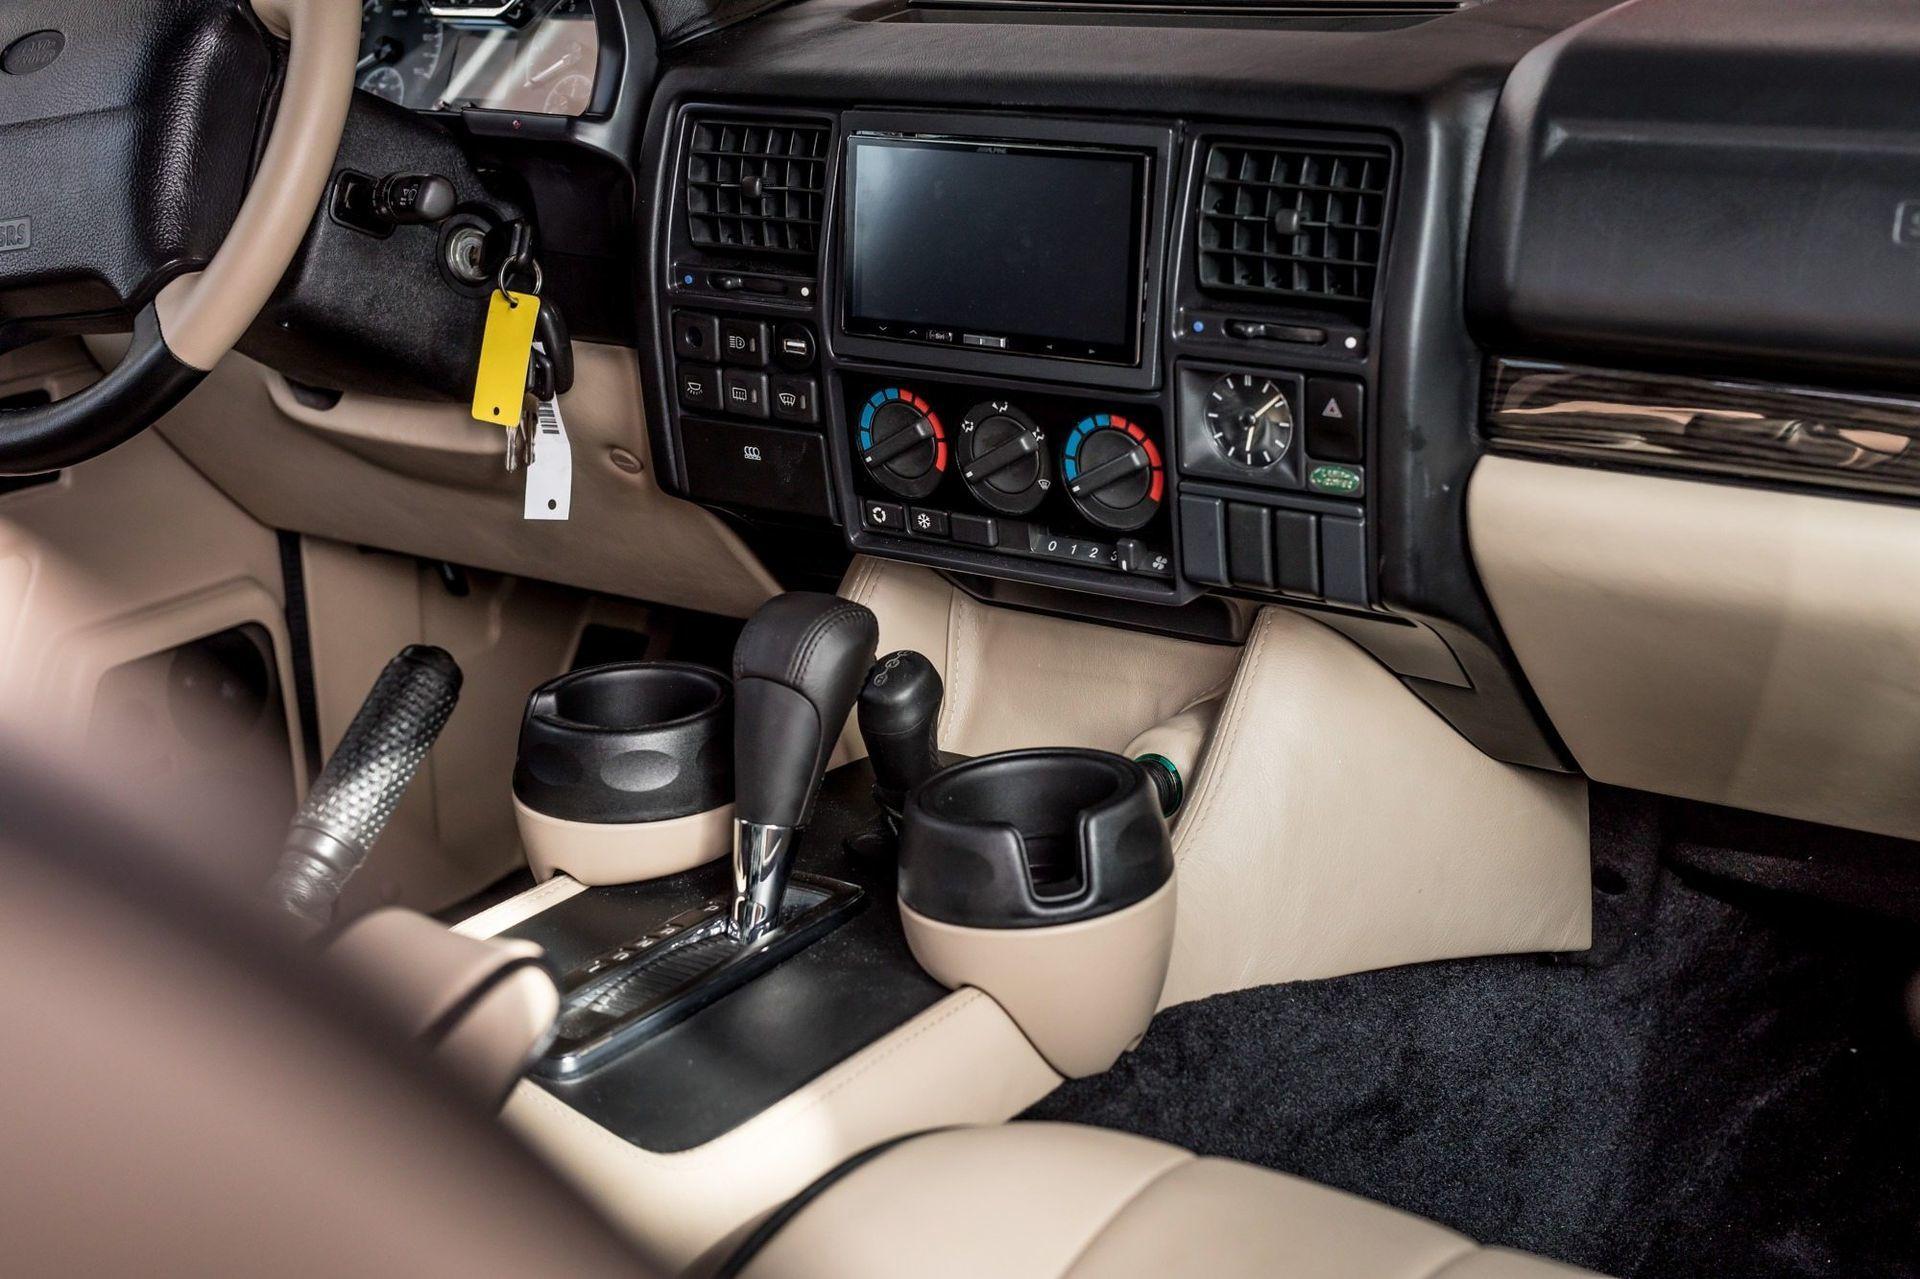 Range Rover Classic Ecd 16